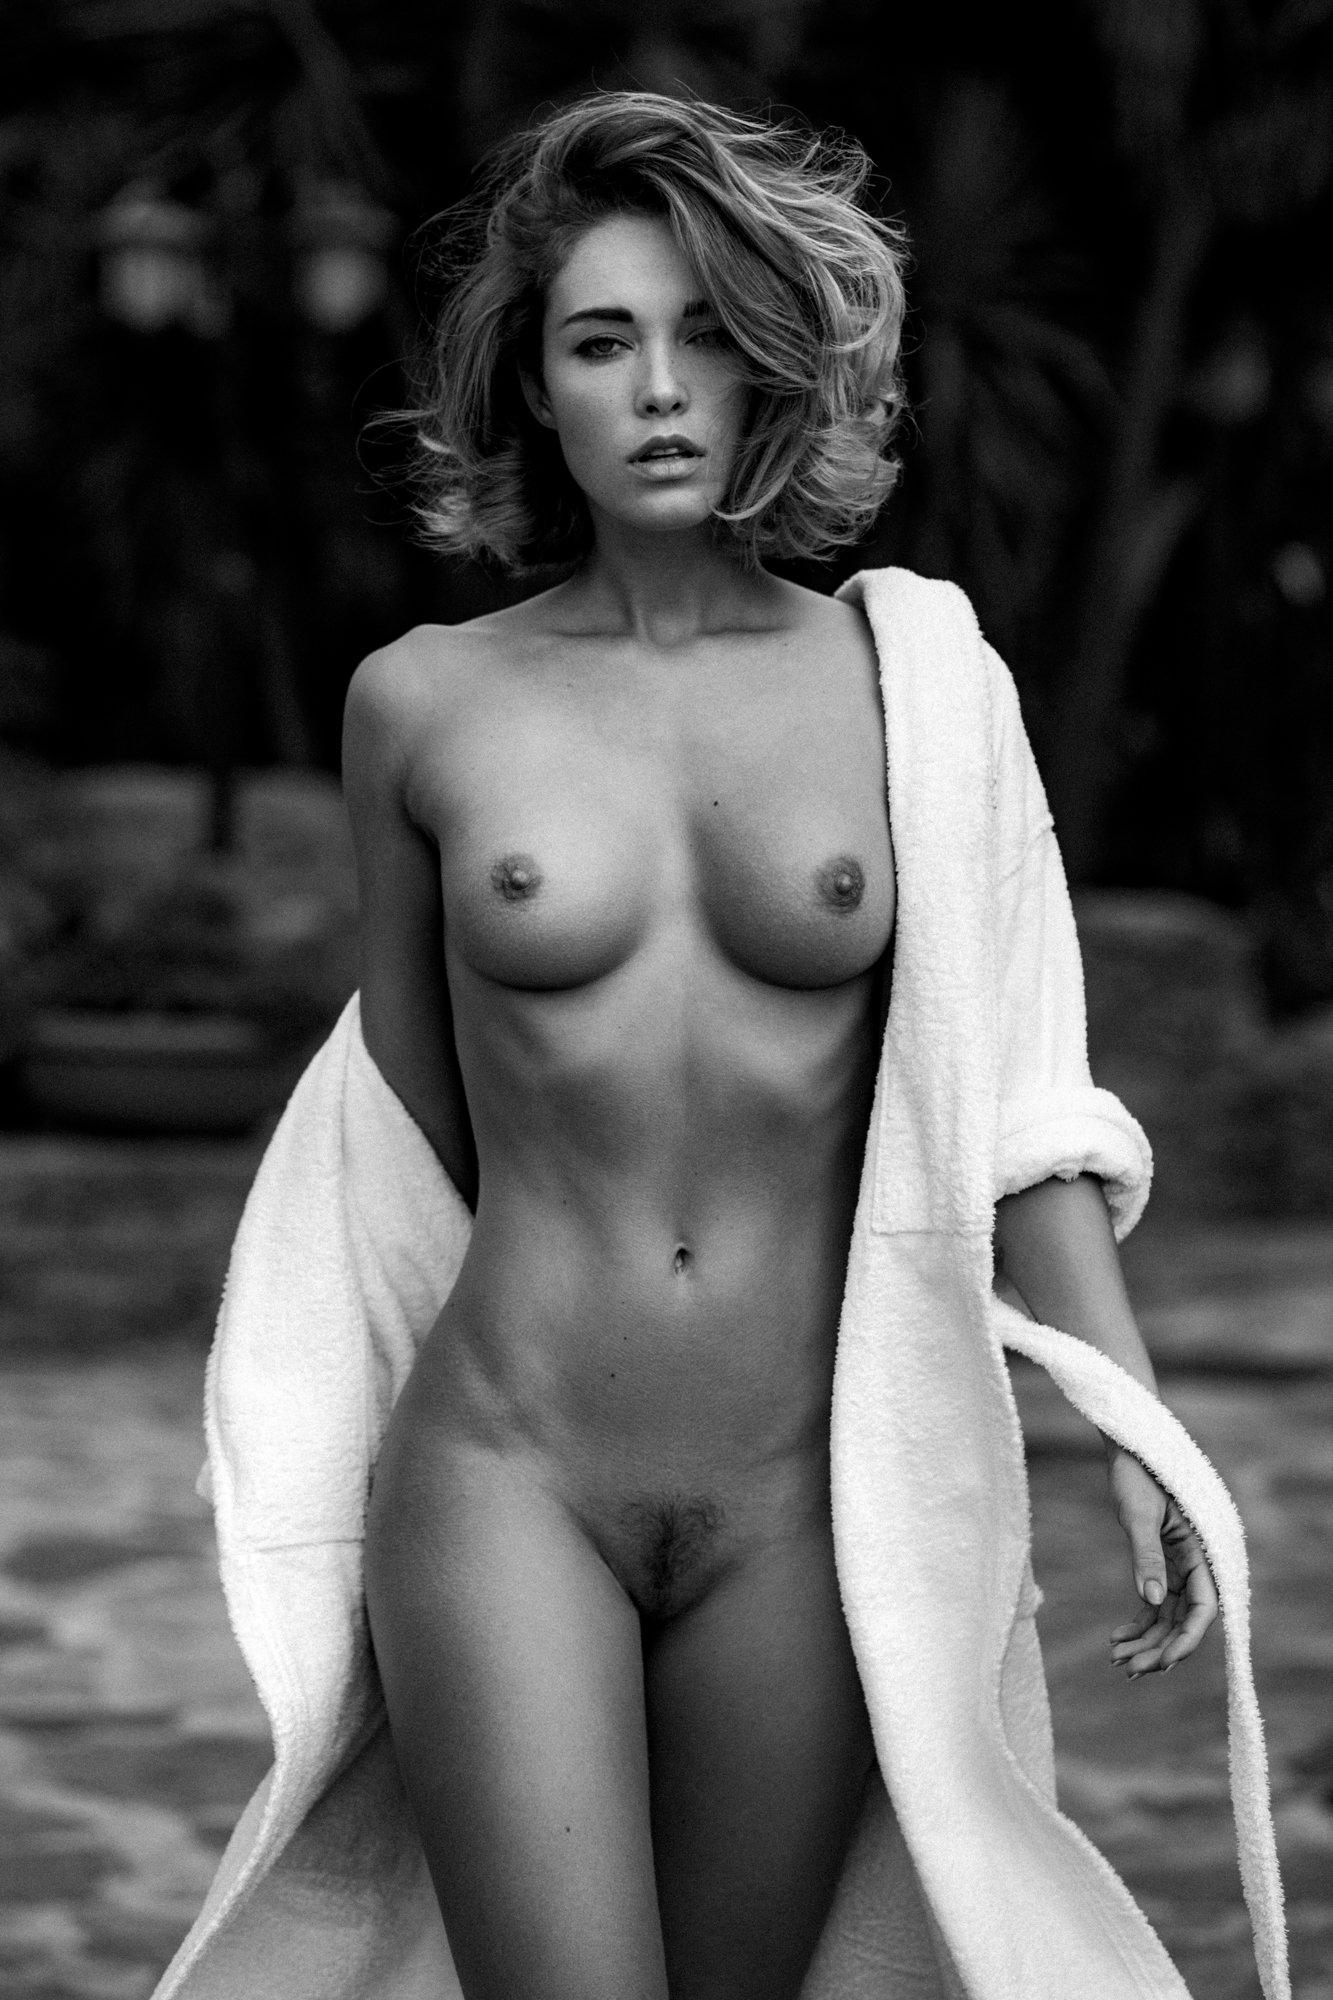 monochrome, black & white, nude, woman, pure, sensual, classic, Leyendecker Sacha